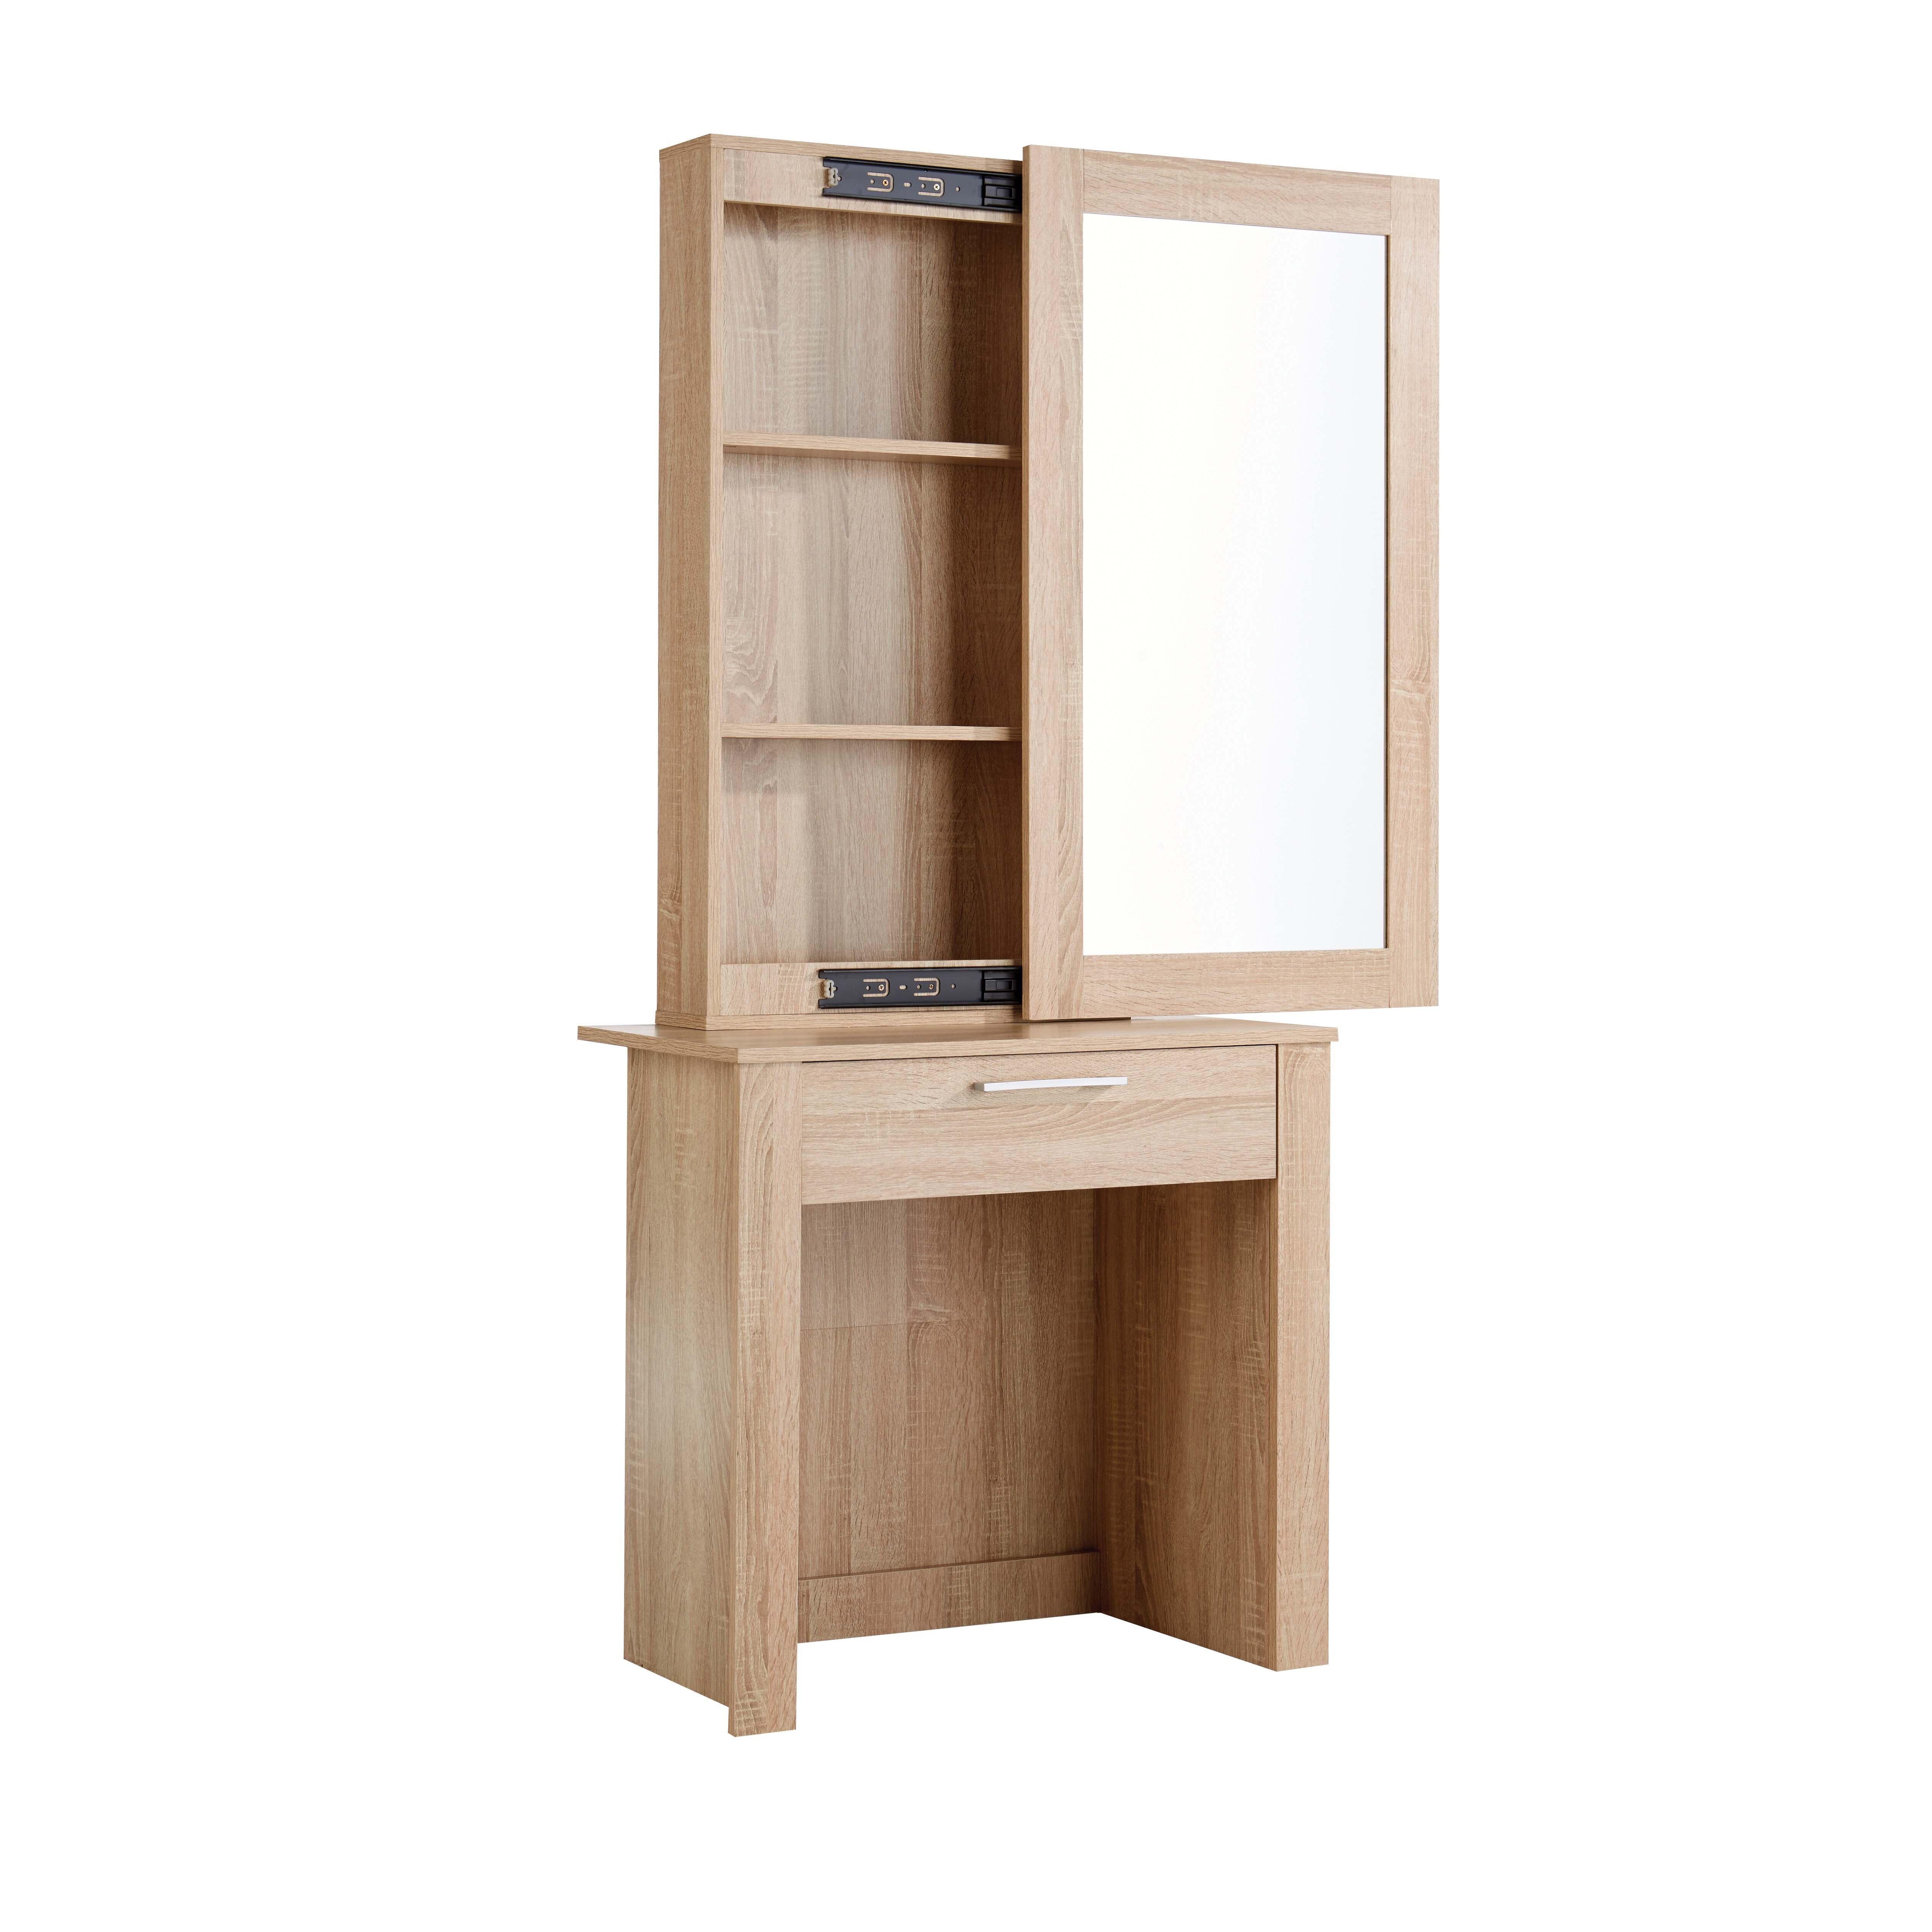 homestead living schminktisch bundarra mit spiegel reviews von homestead living. Black Bedroom Furniture Sets. Home Design Ideas